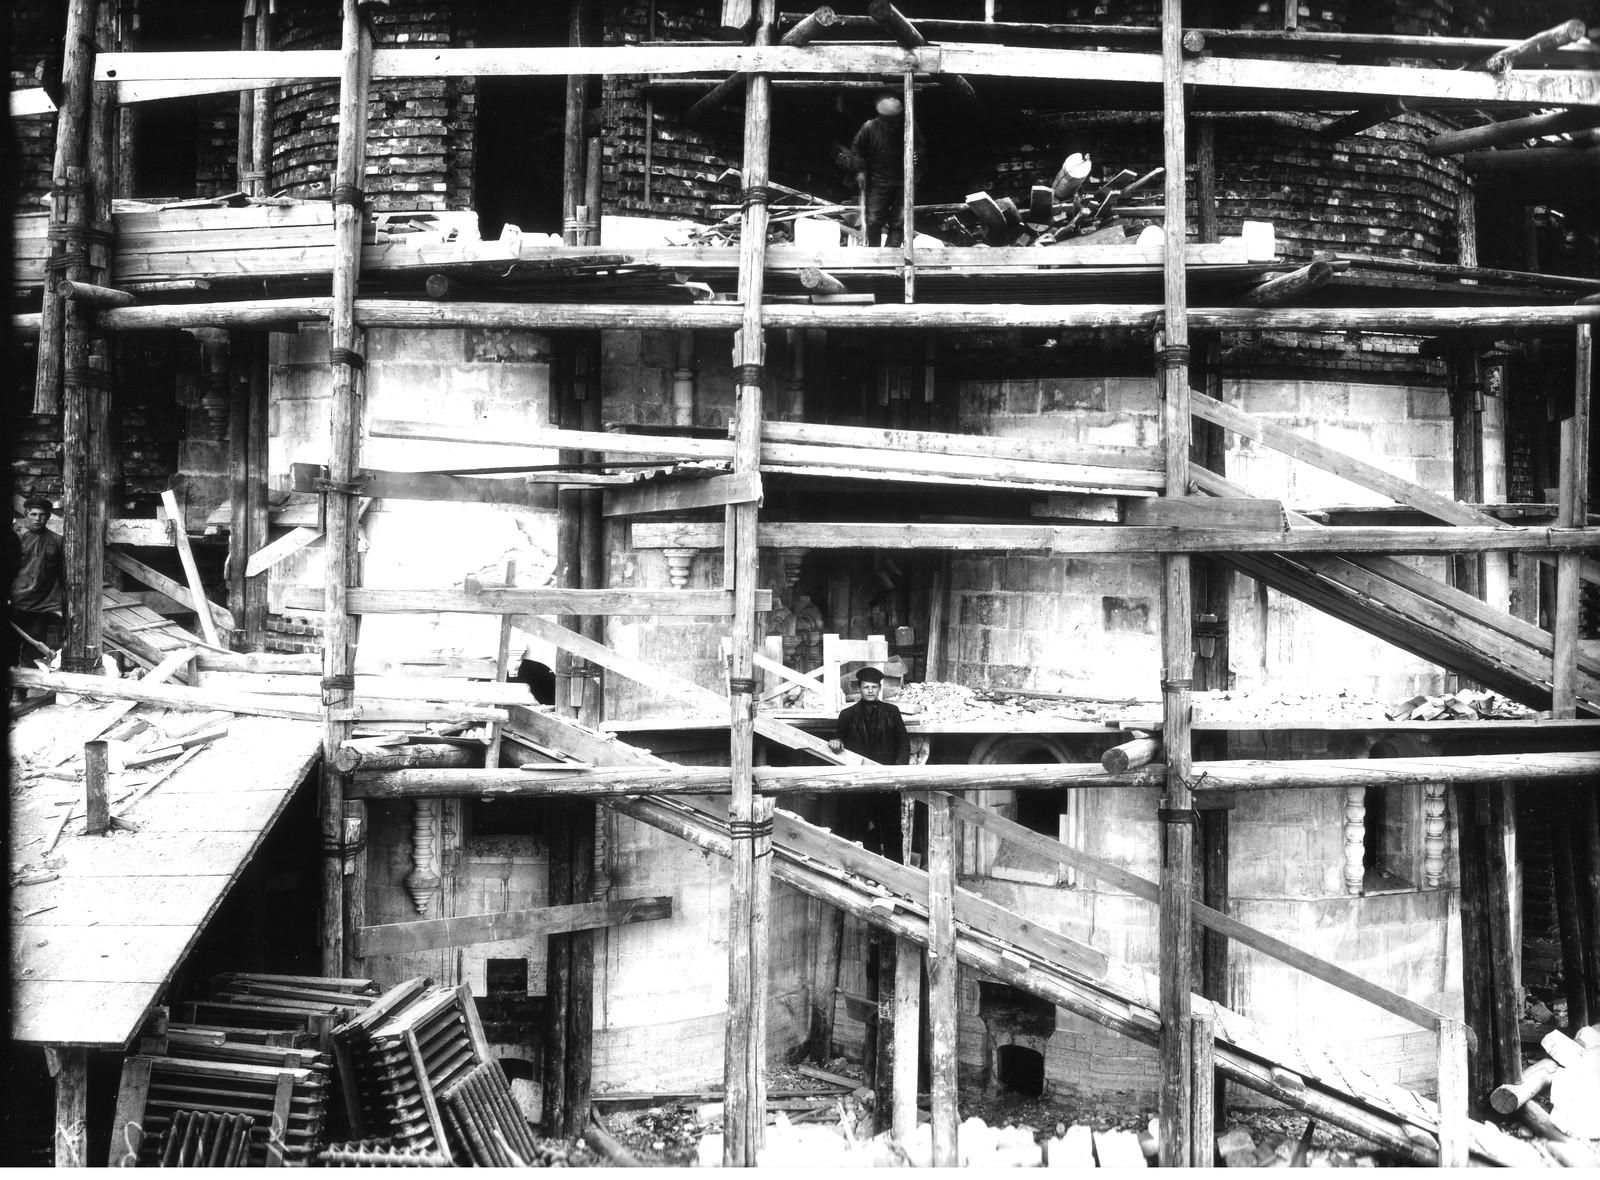 06. 1913. Абсида Храма в процессе облицовки белым известняком